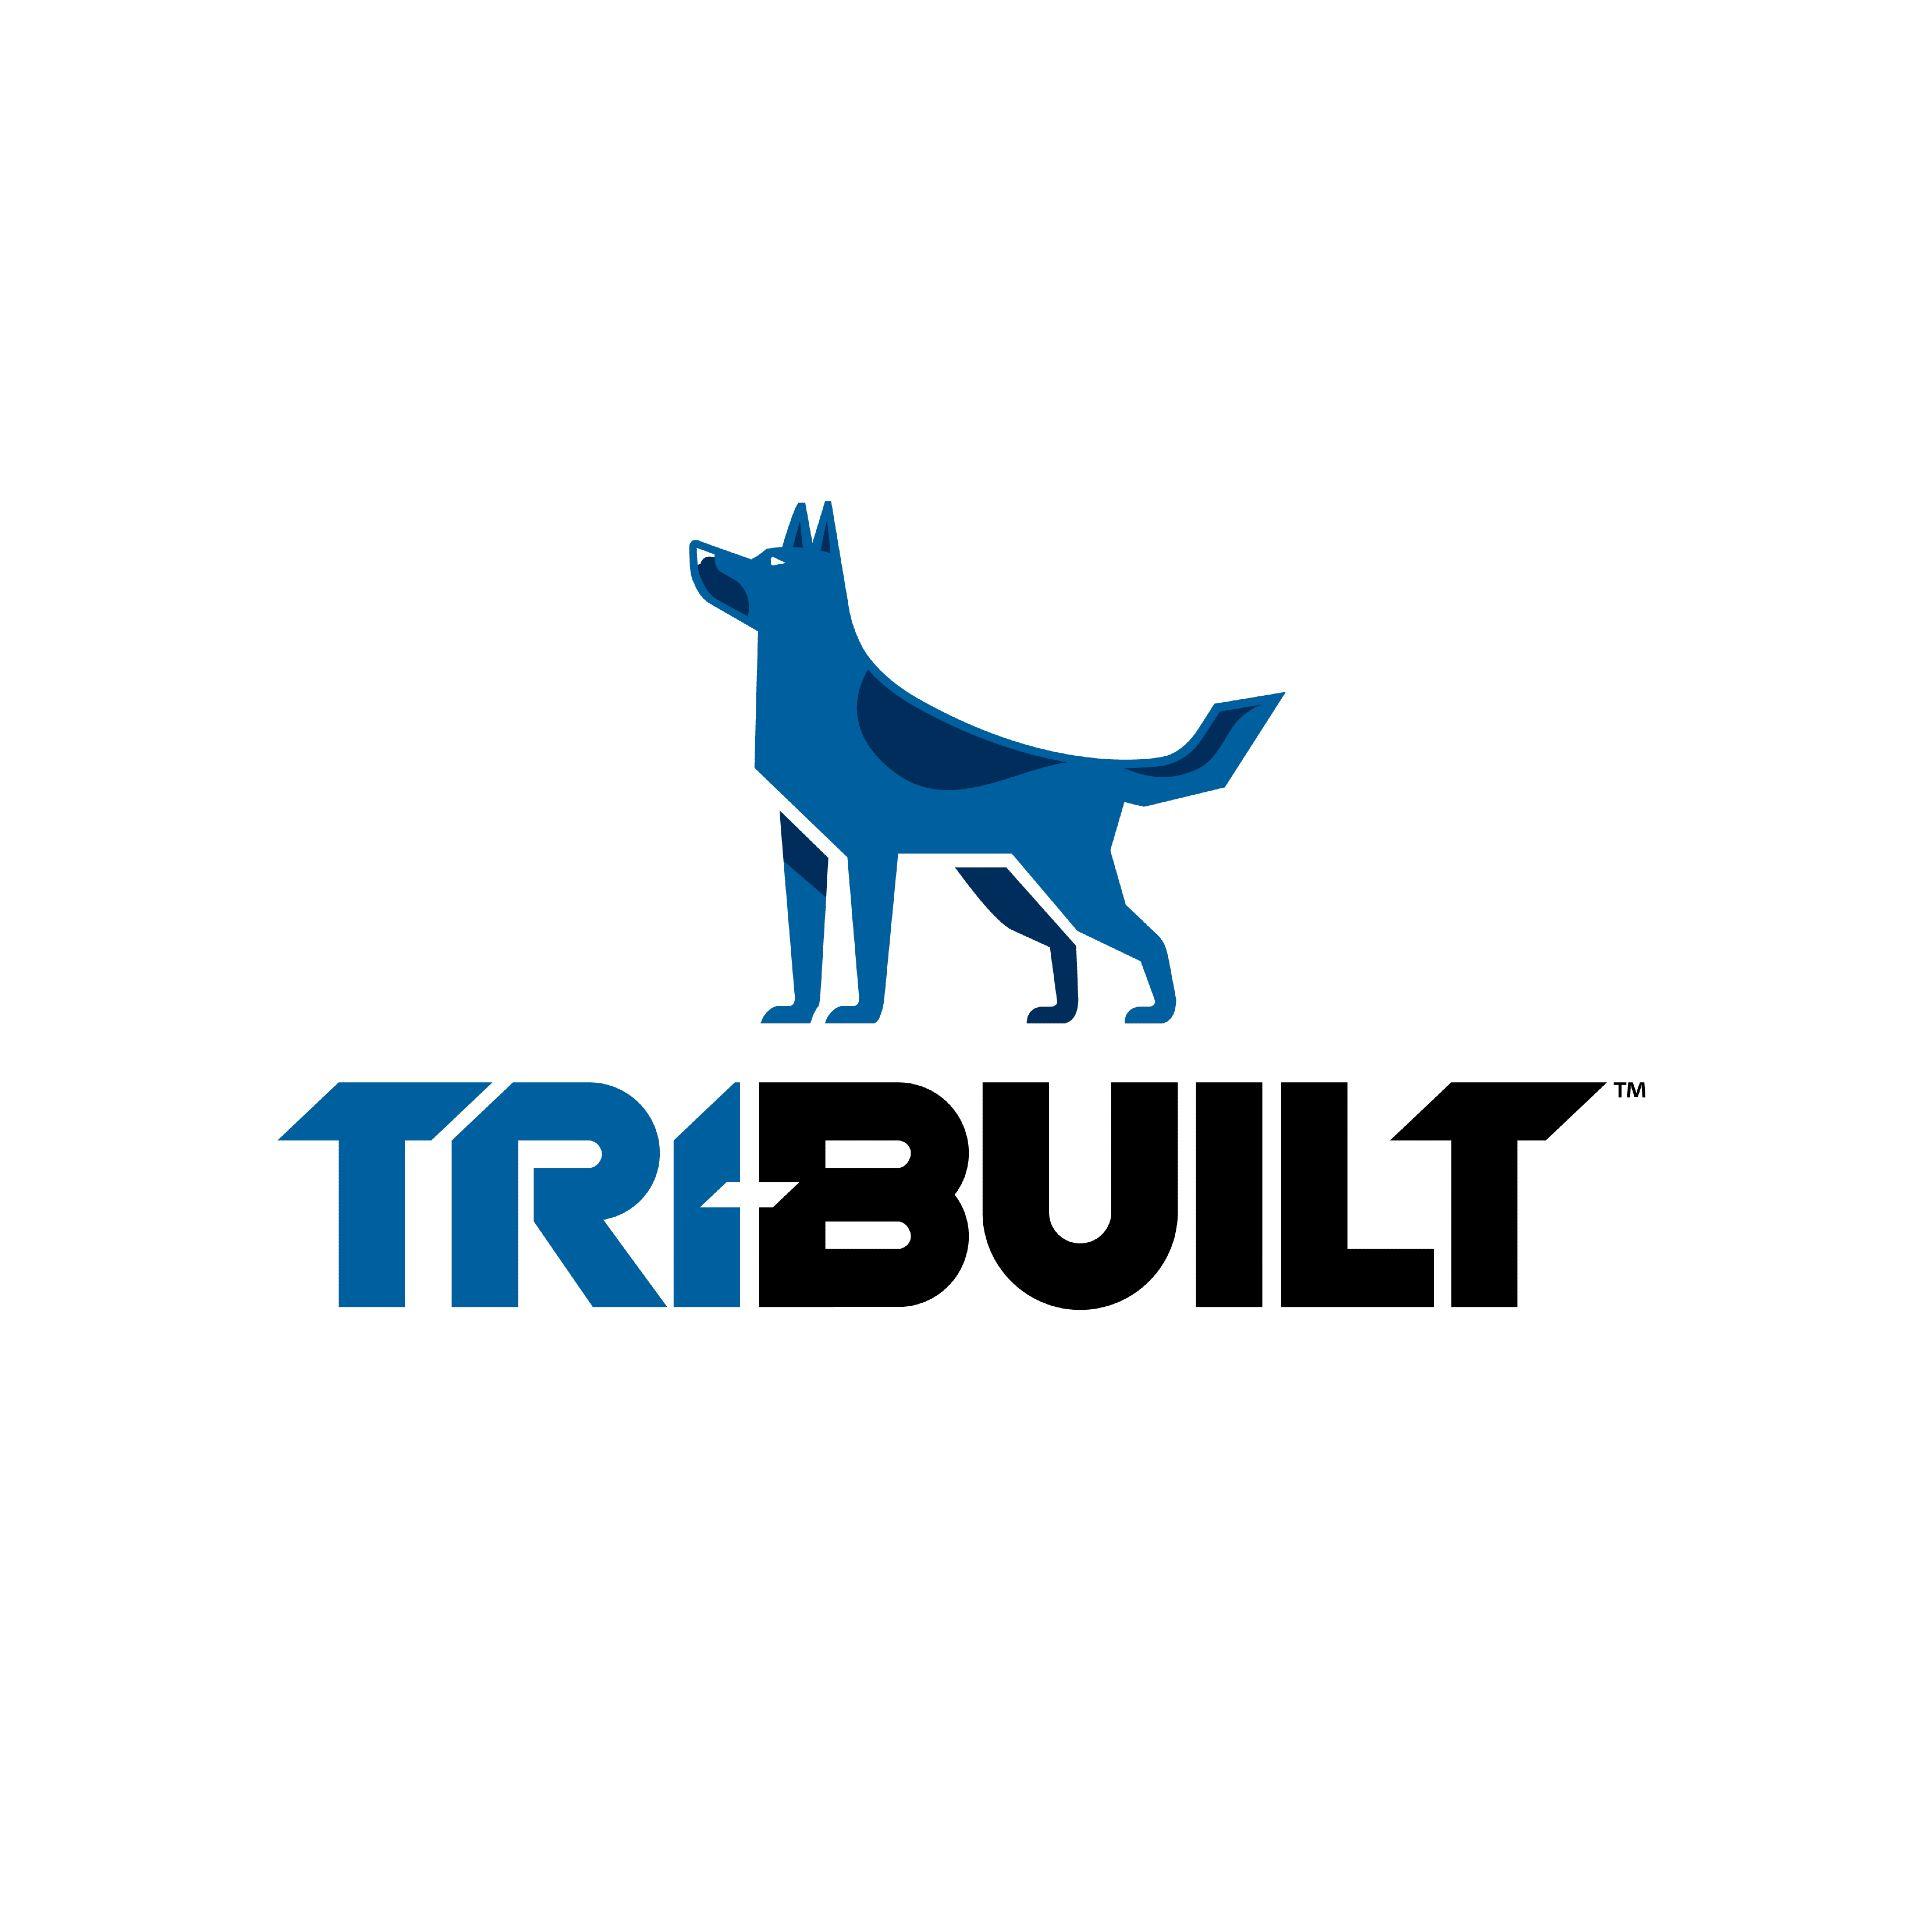 "TRI-BUILT 1/2"" x 4' x 8' High Density Fiberboard Coated on 6 Sides"